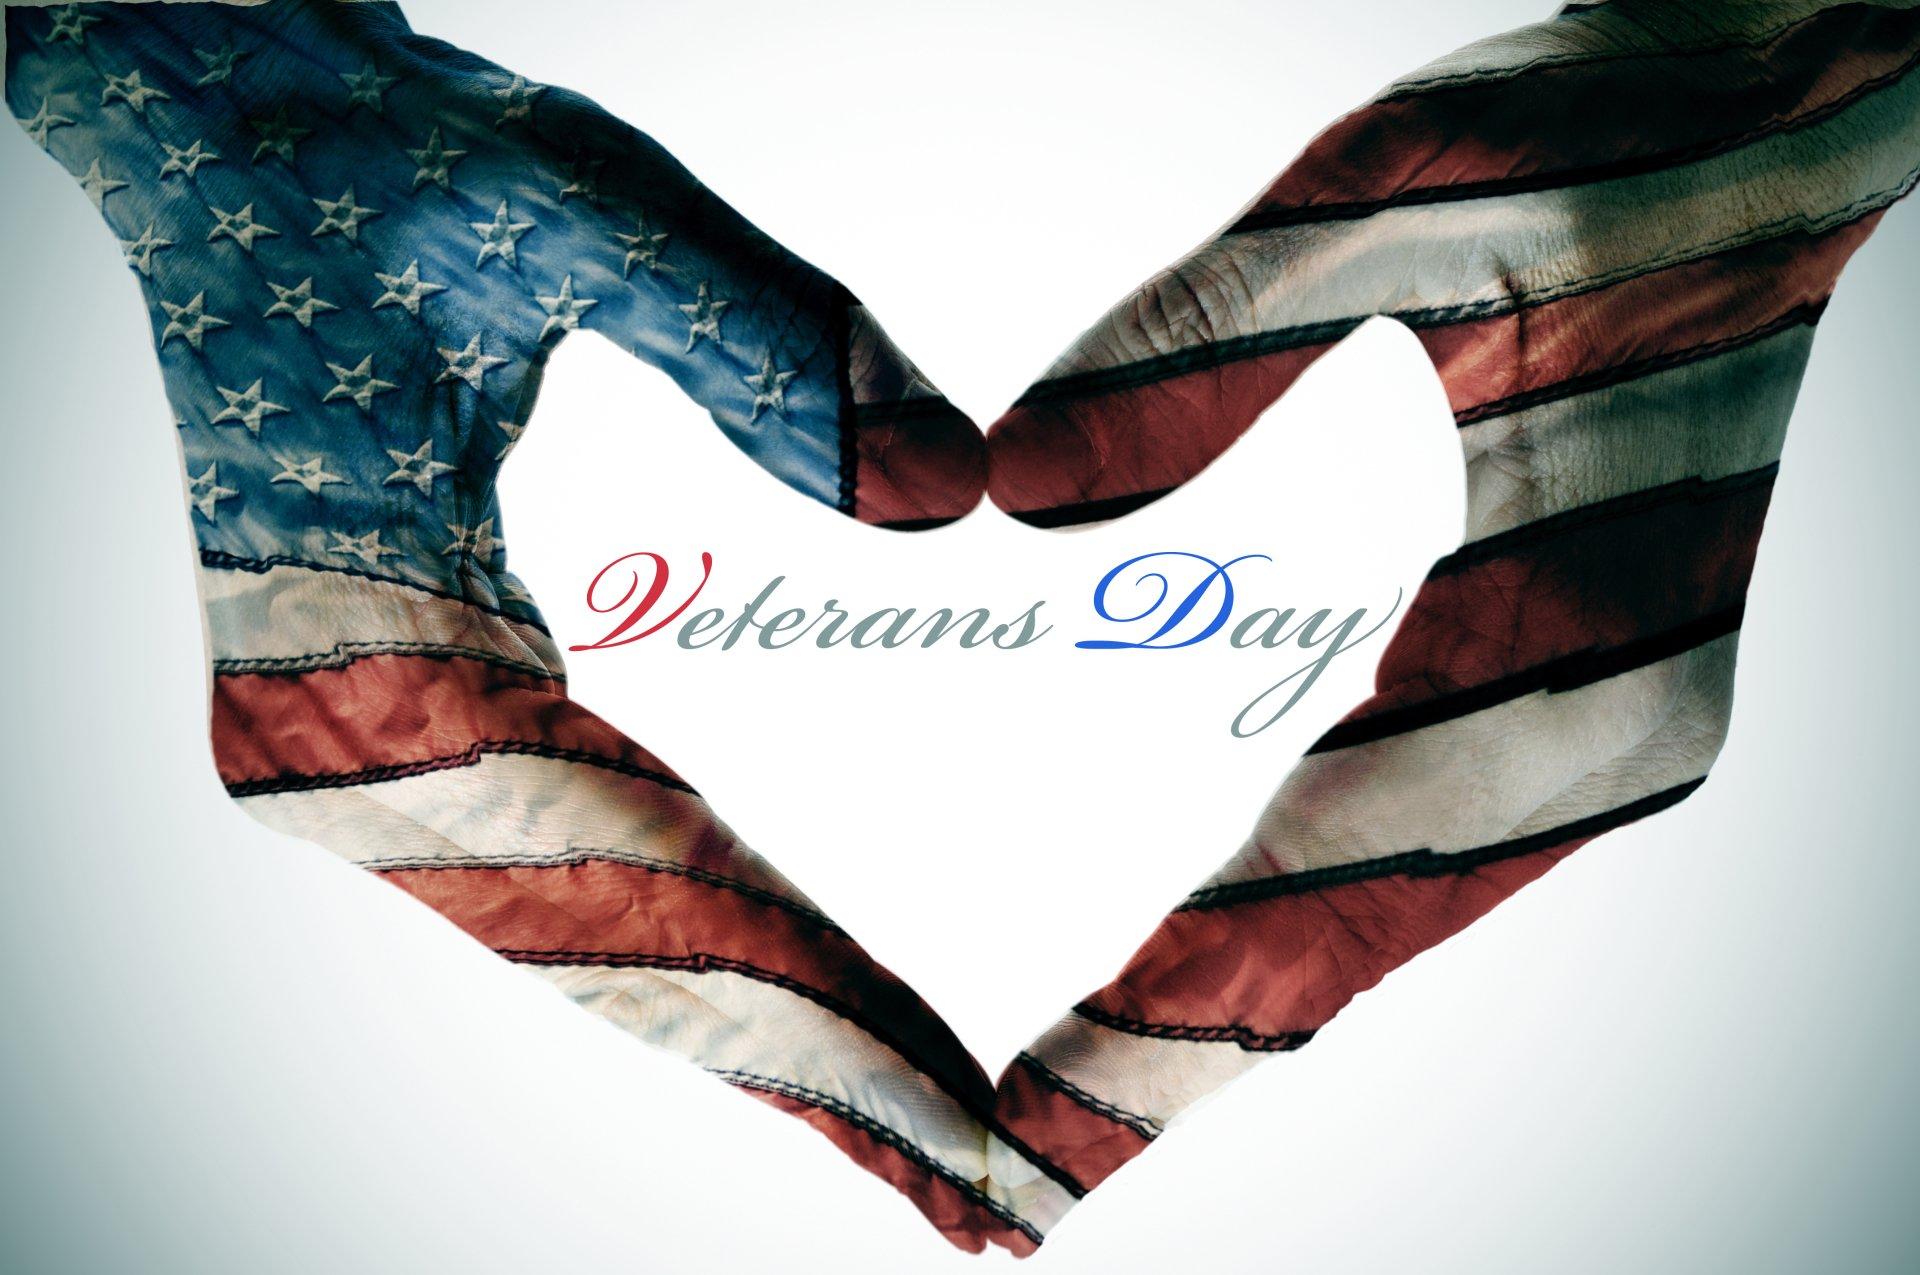 veterans day 4k ultra hd wallpaper  background image